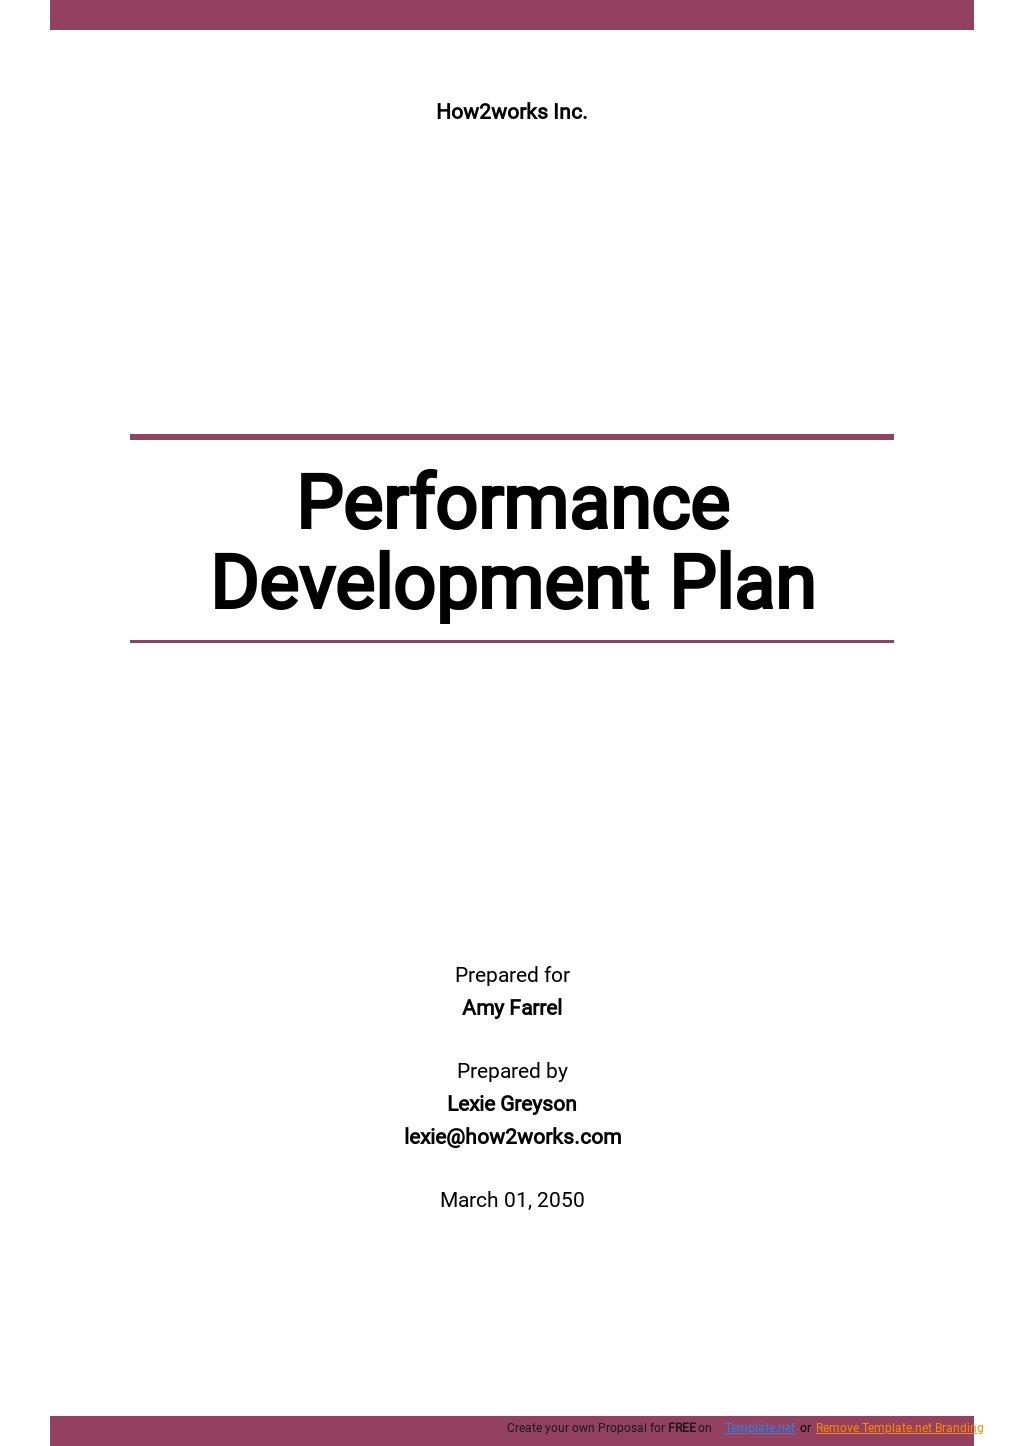 Sample Performance Development Plan Template.jpe